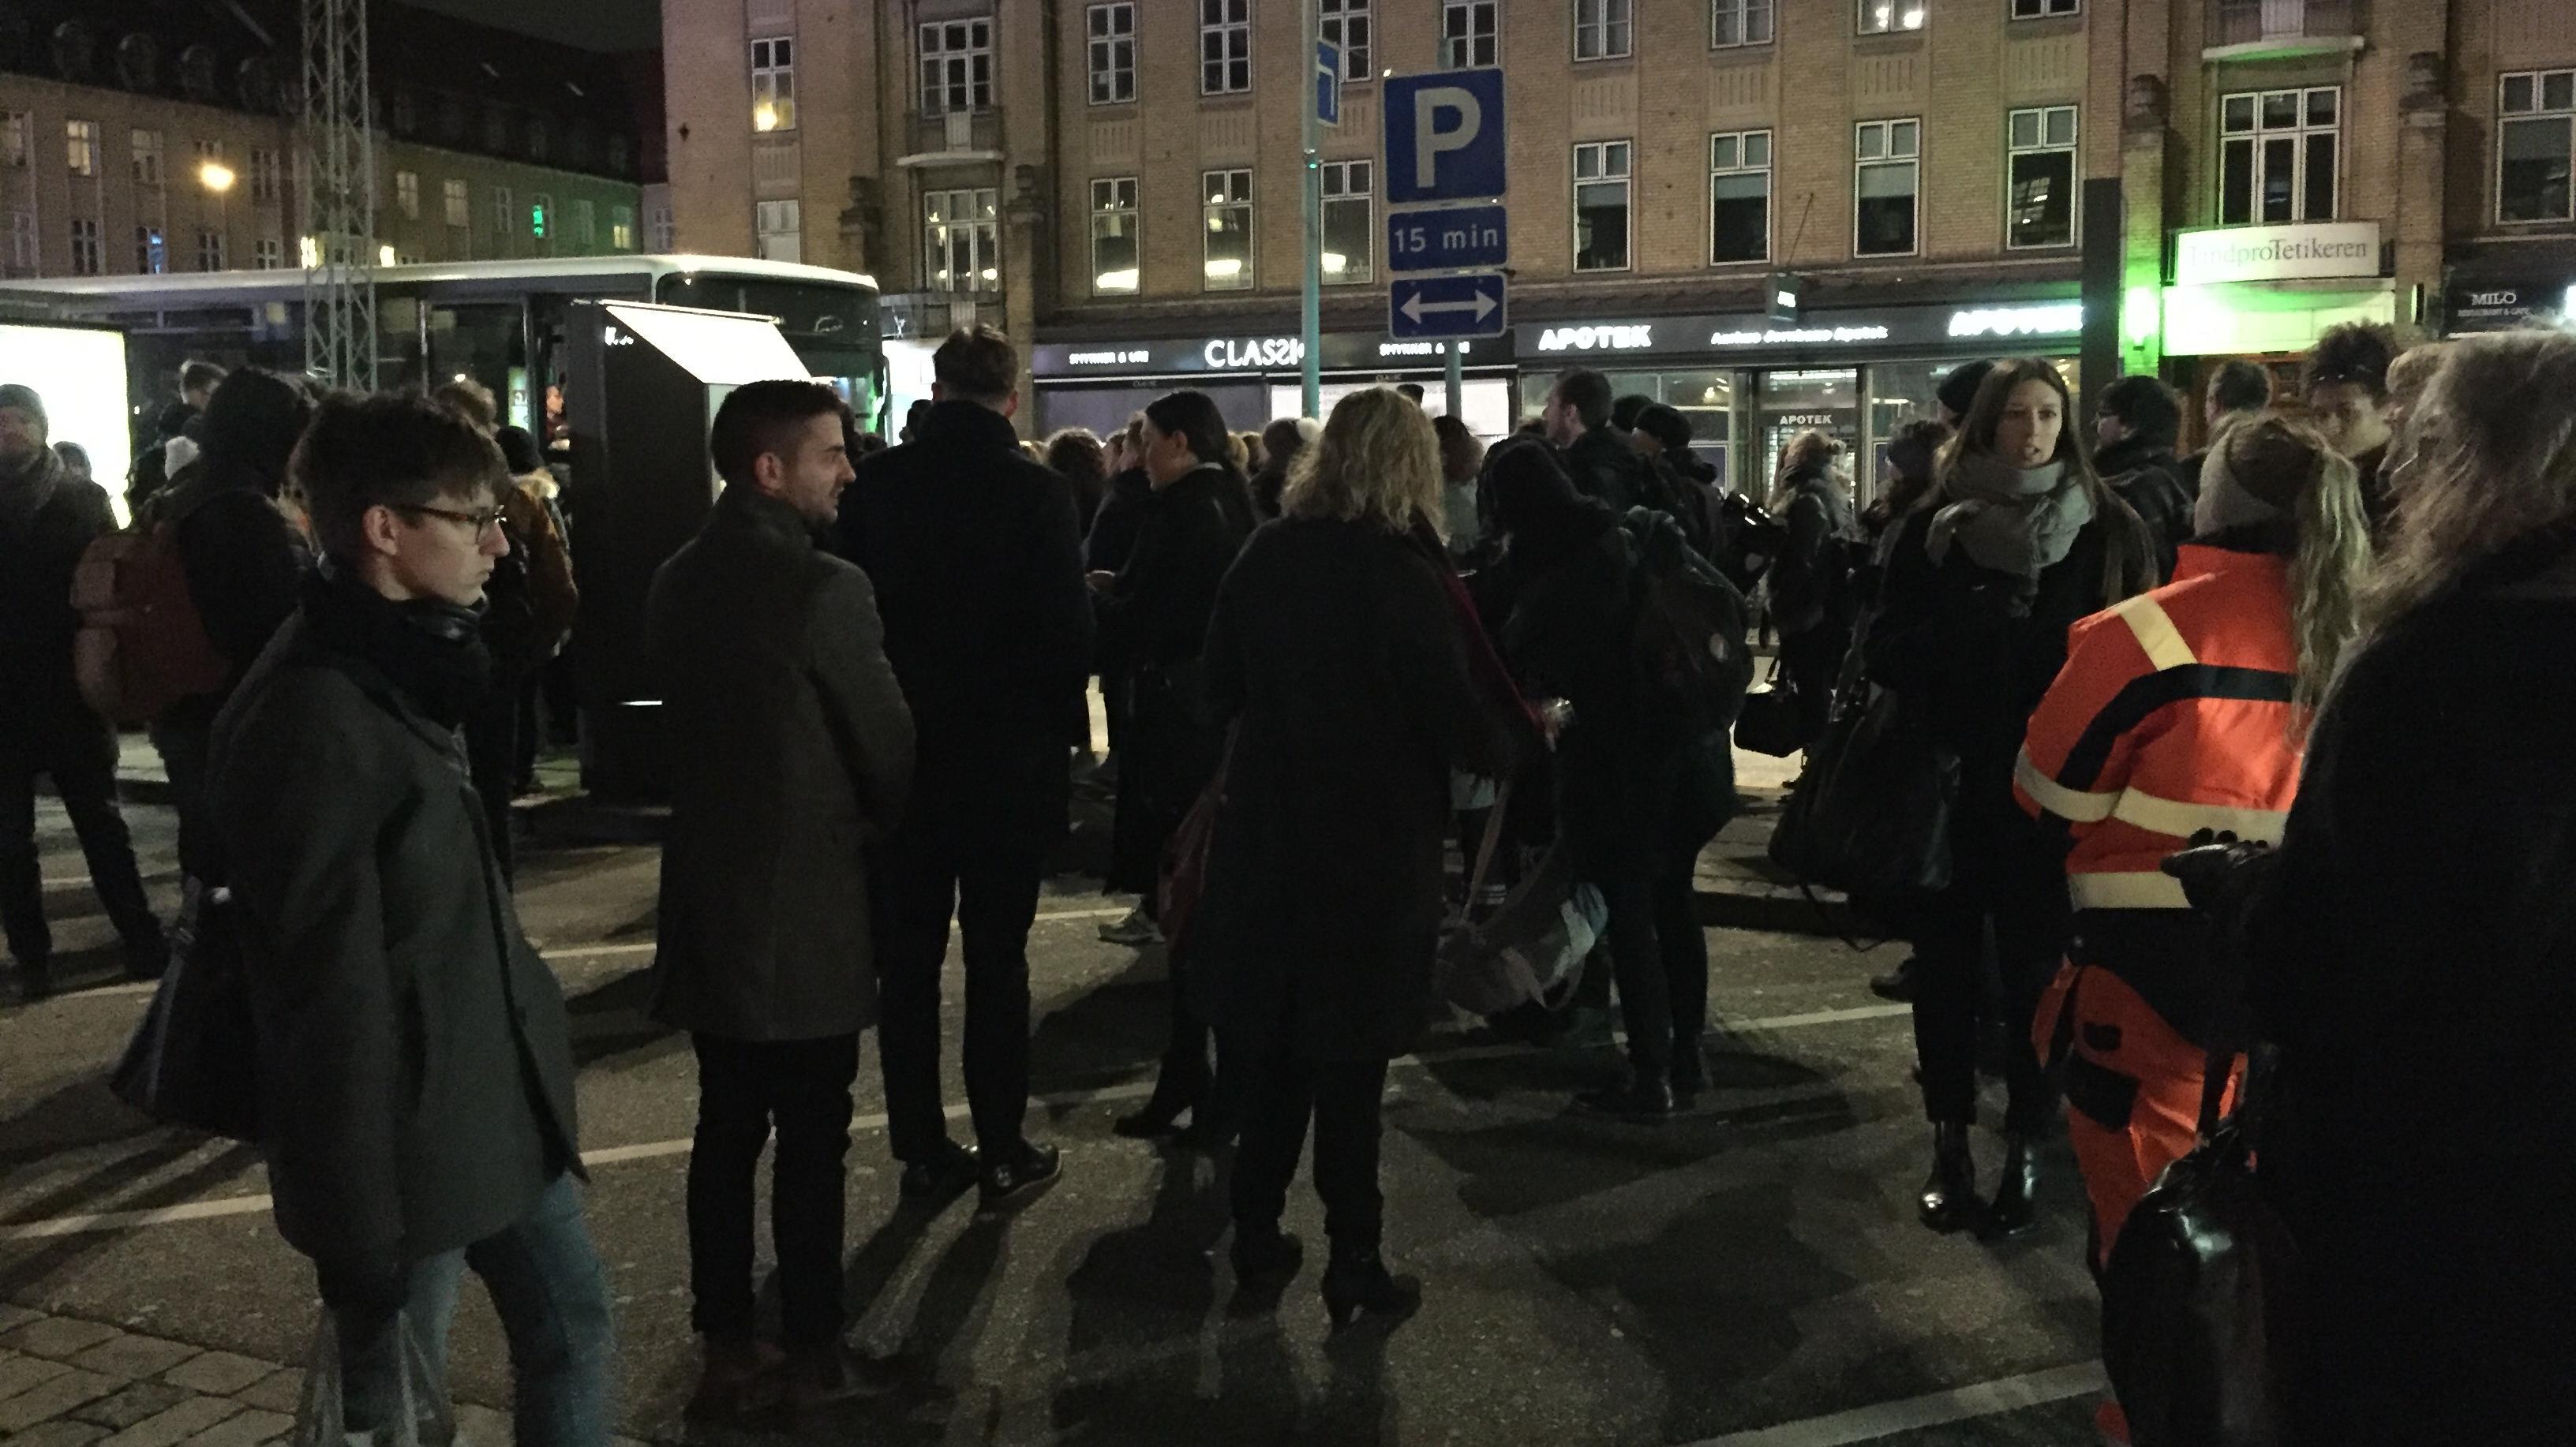 Togbusser på aarhus Hovedbanegård